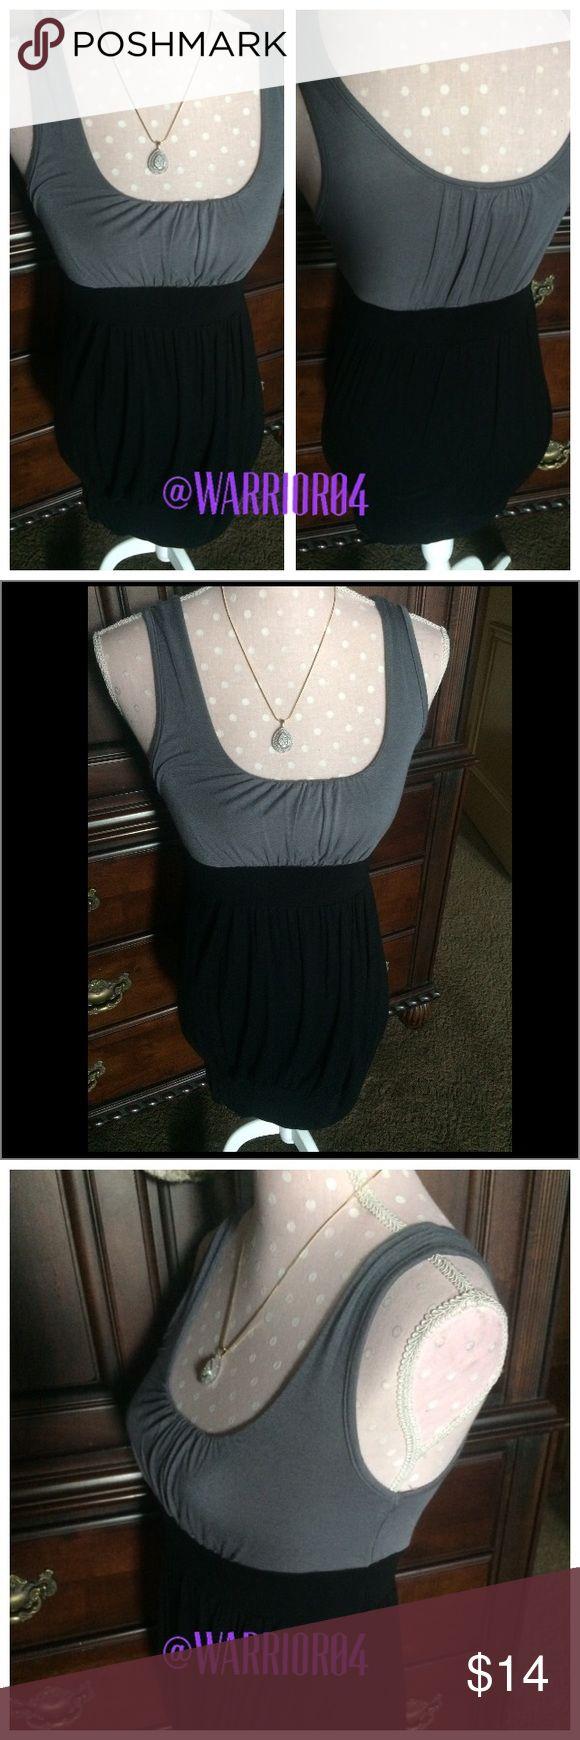 Body Central Gray & Black Dress Body Central Gray & Black Dress Body Central Dresses